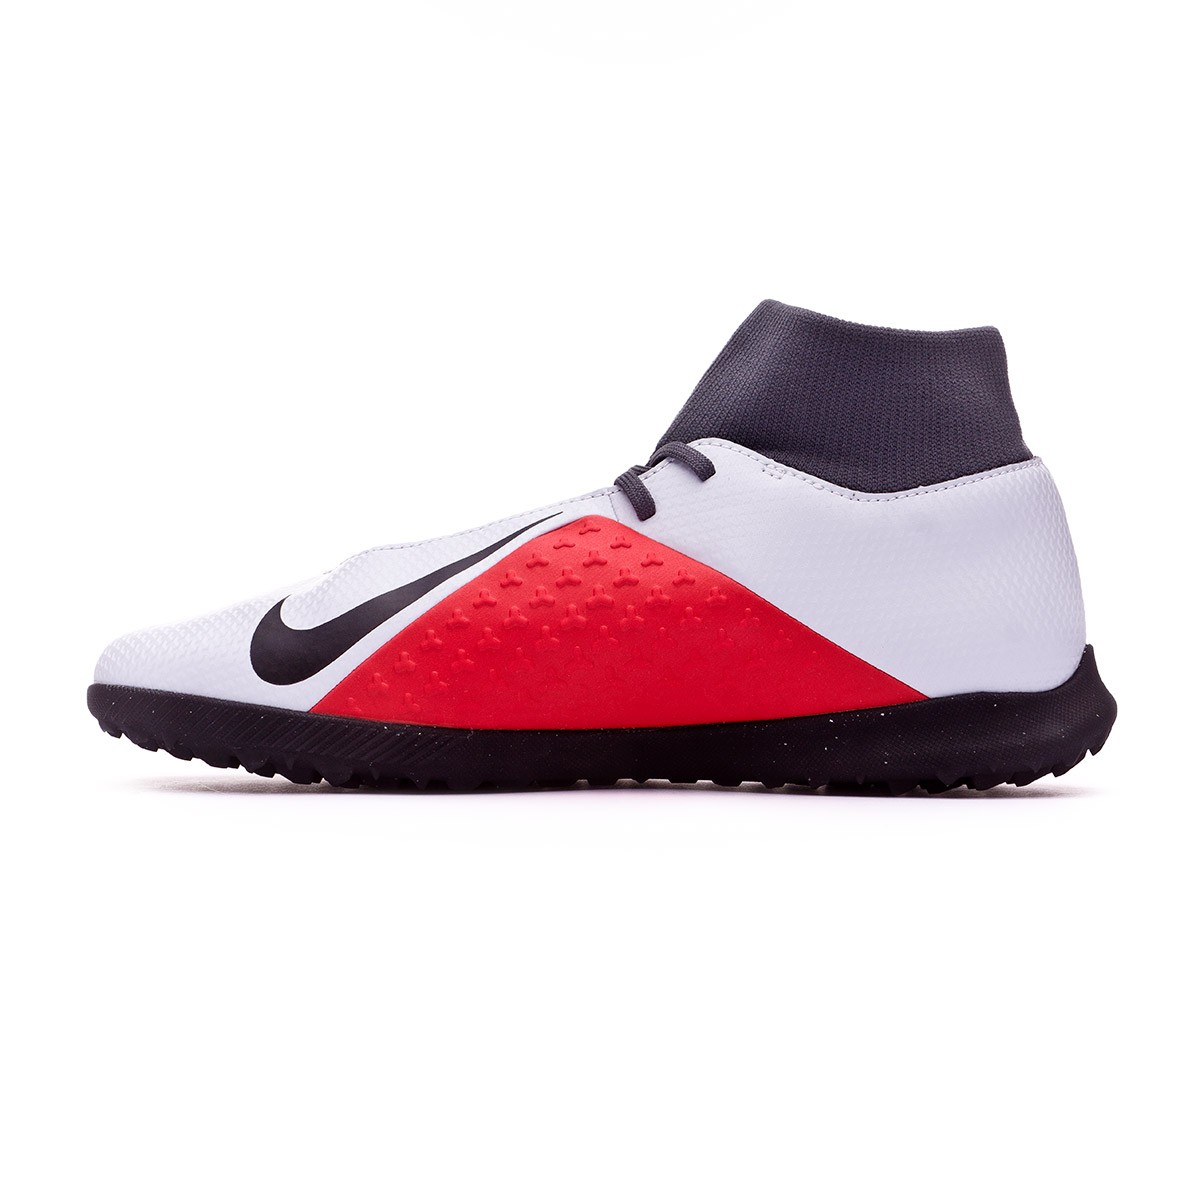 cc1dd792fc6 Football Boot Nike Phantom Vision Club DF Turf Pure platinum-Black-Light  crimson-Dark grey - Football store Fútbol Emotion